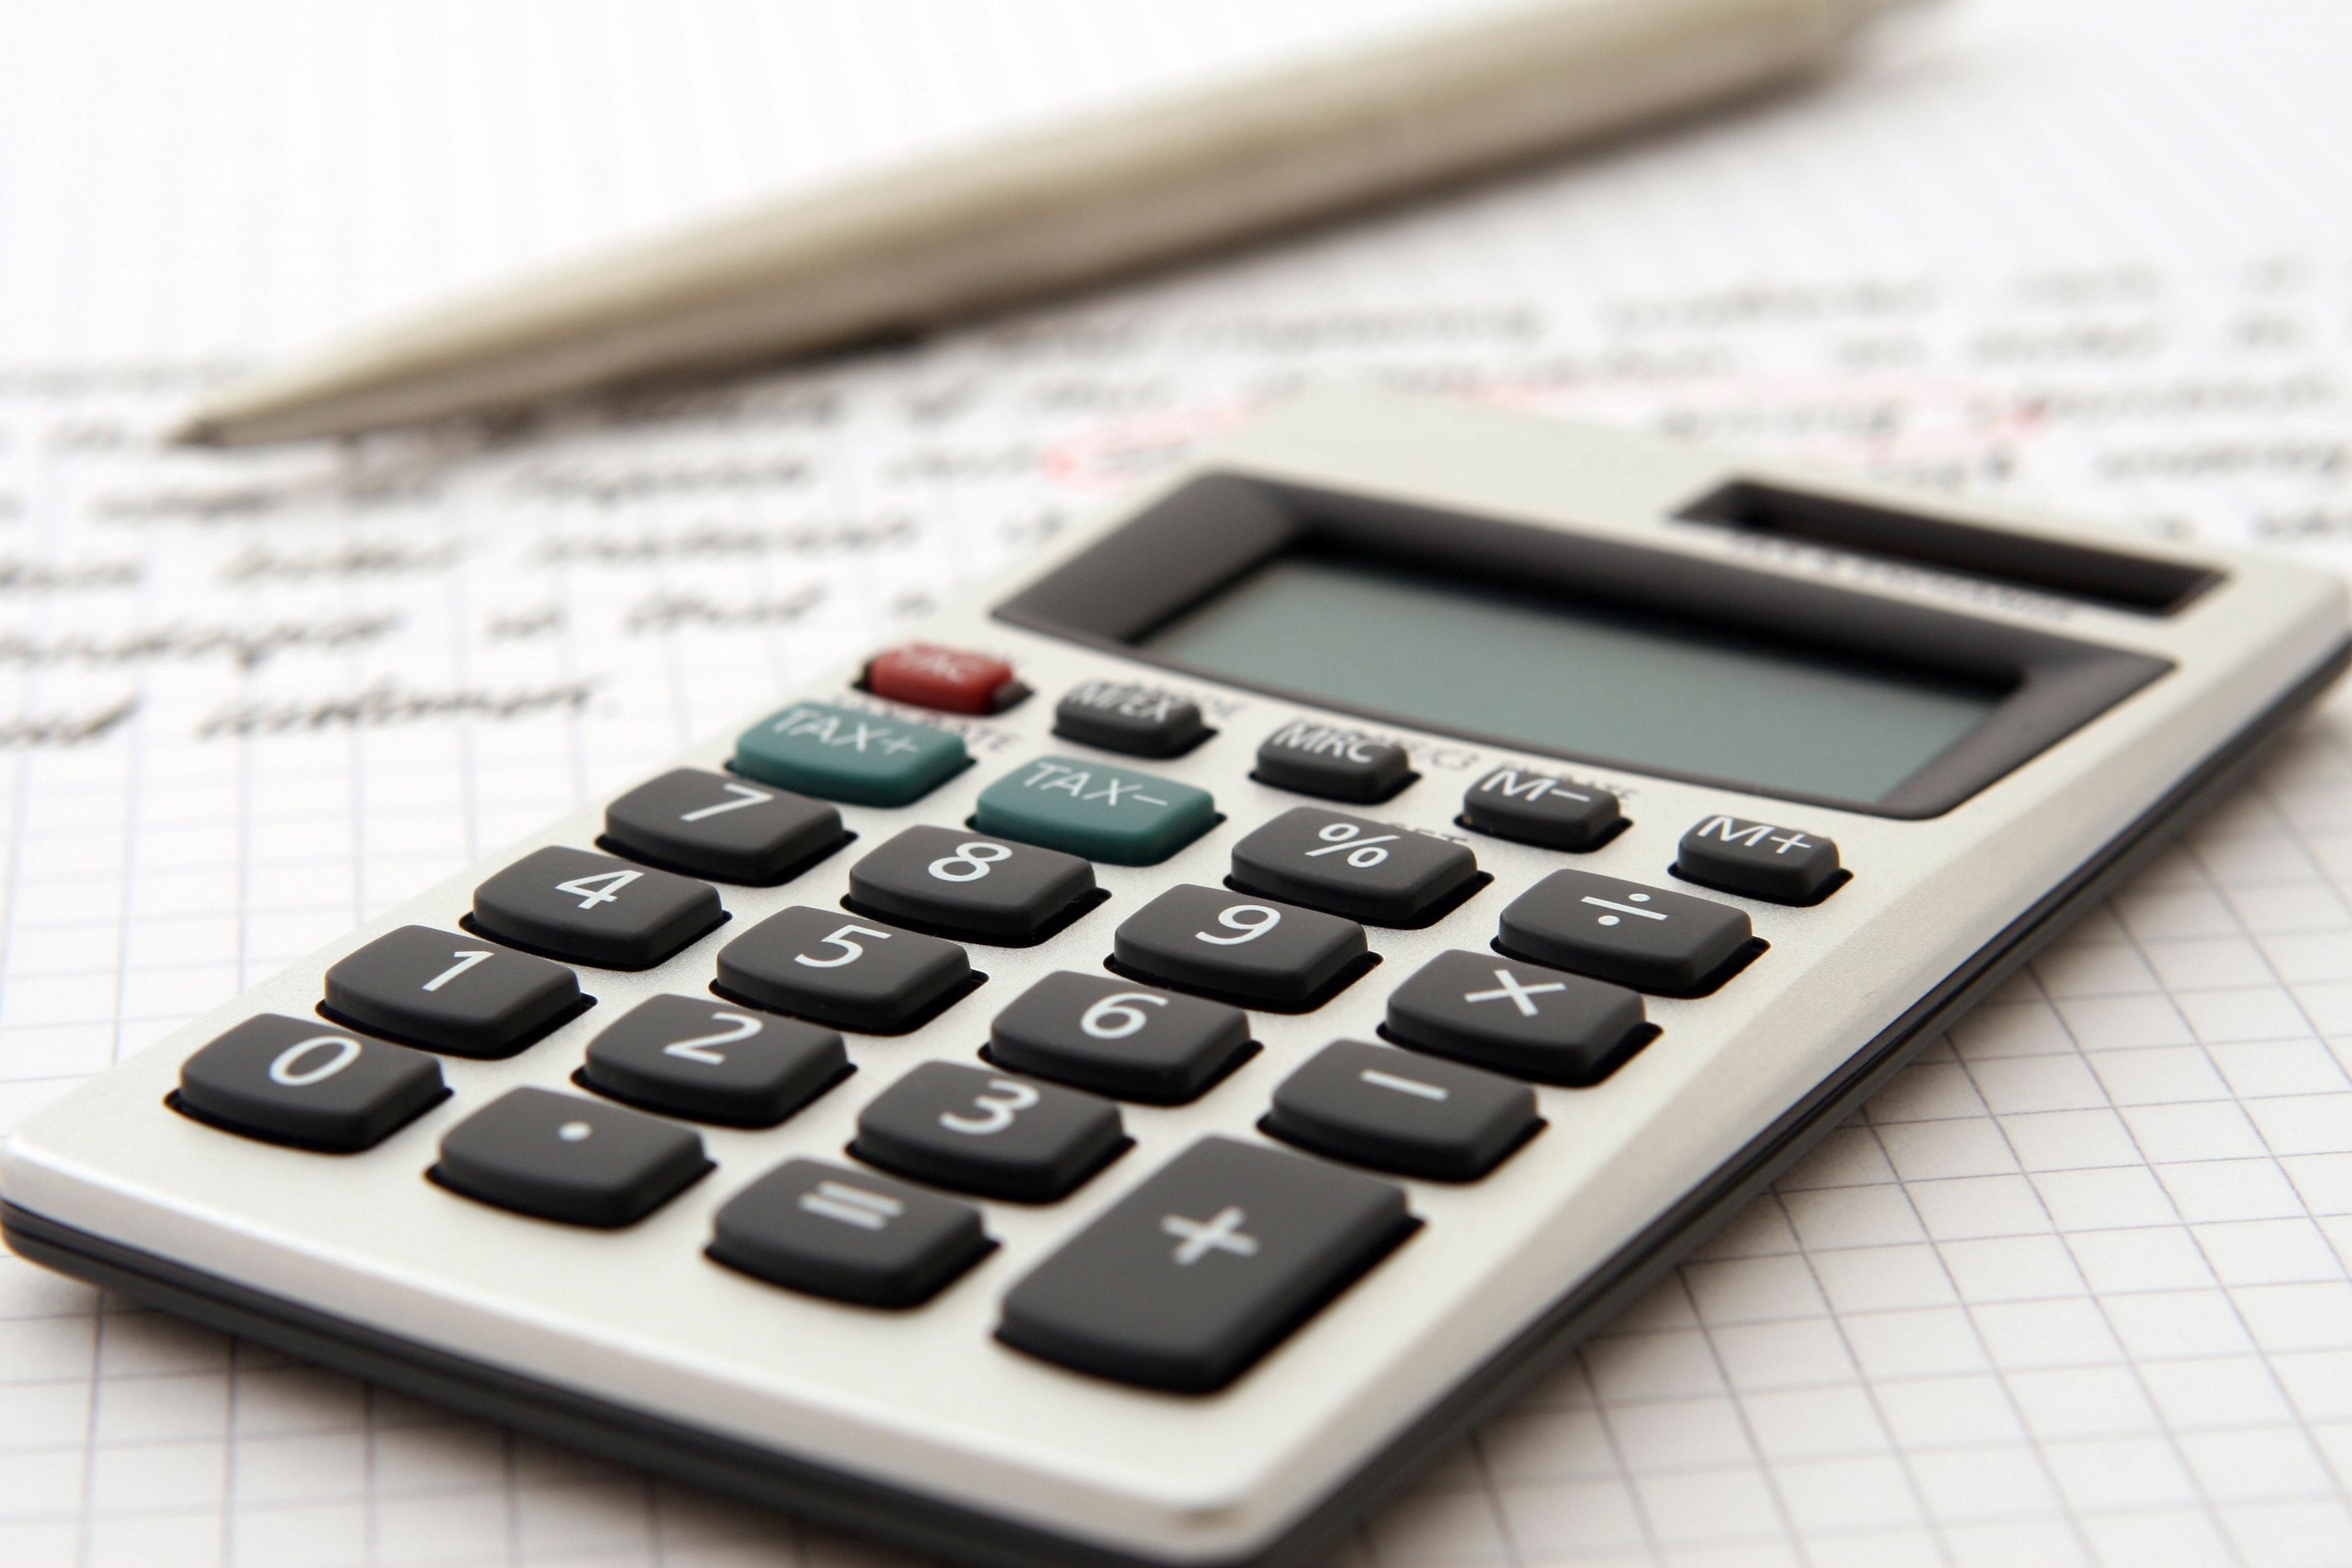 Corporation Contributions - Solo 401k